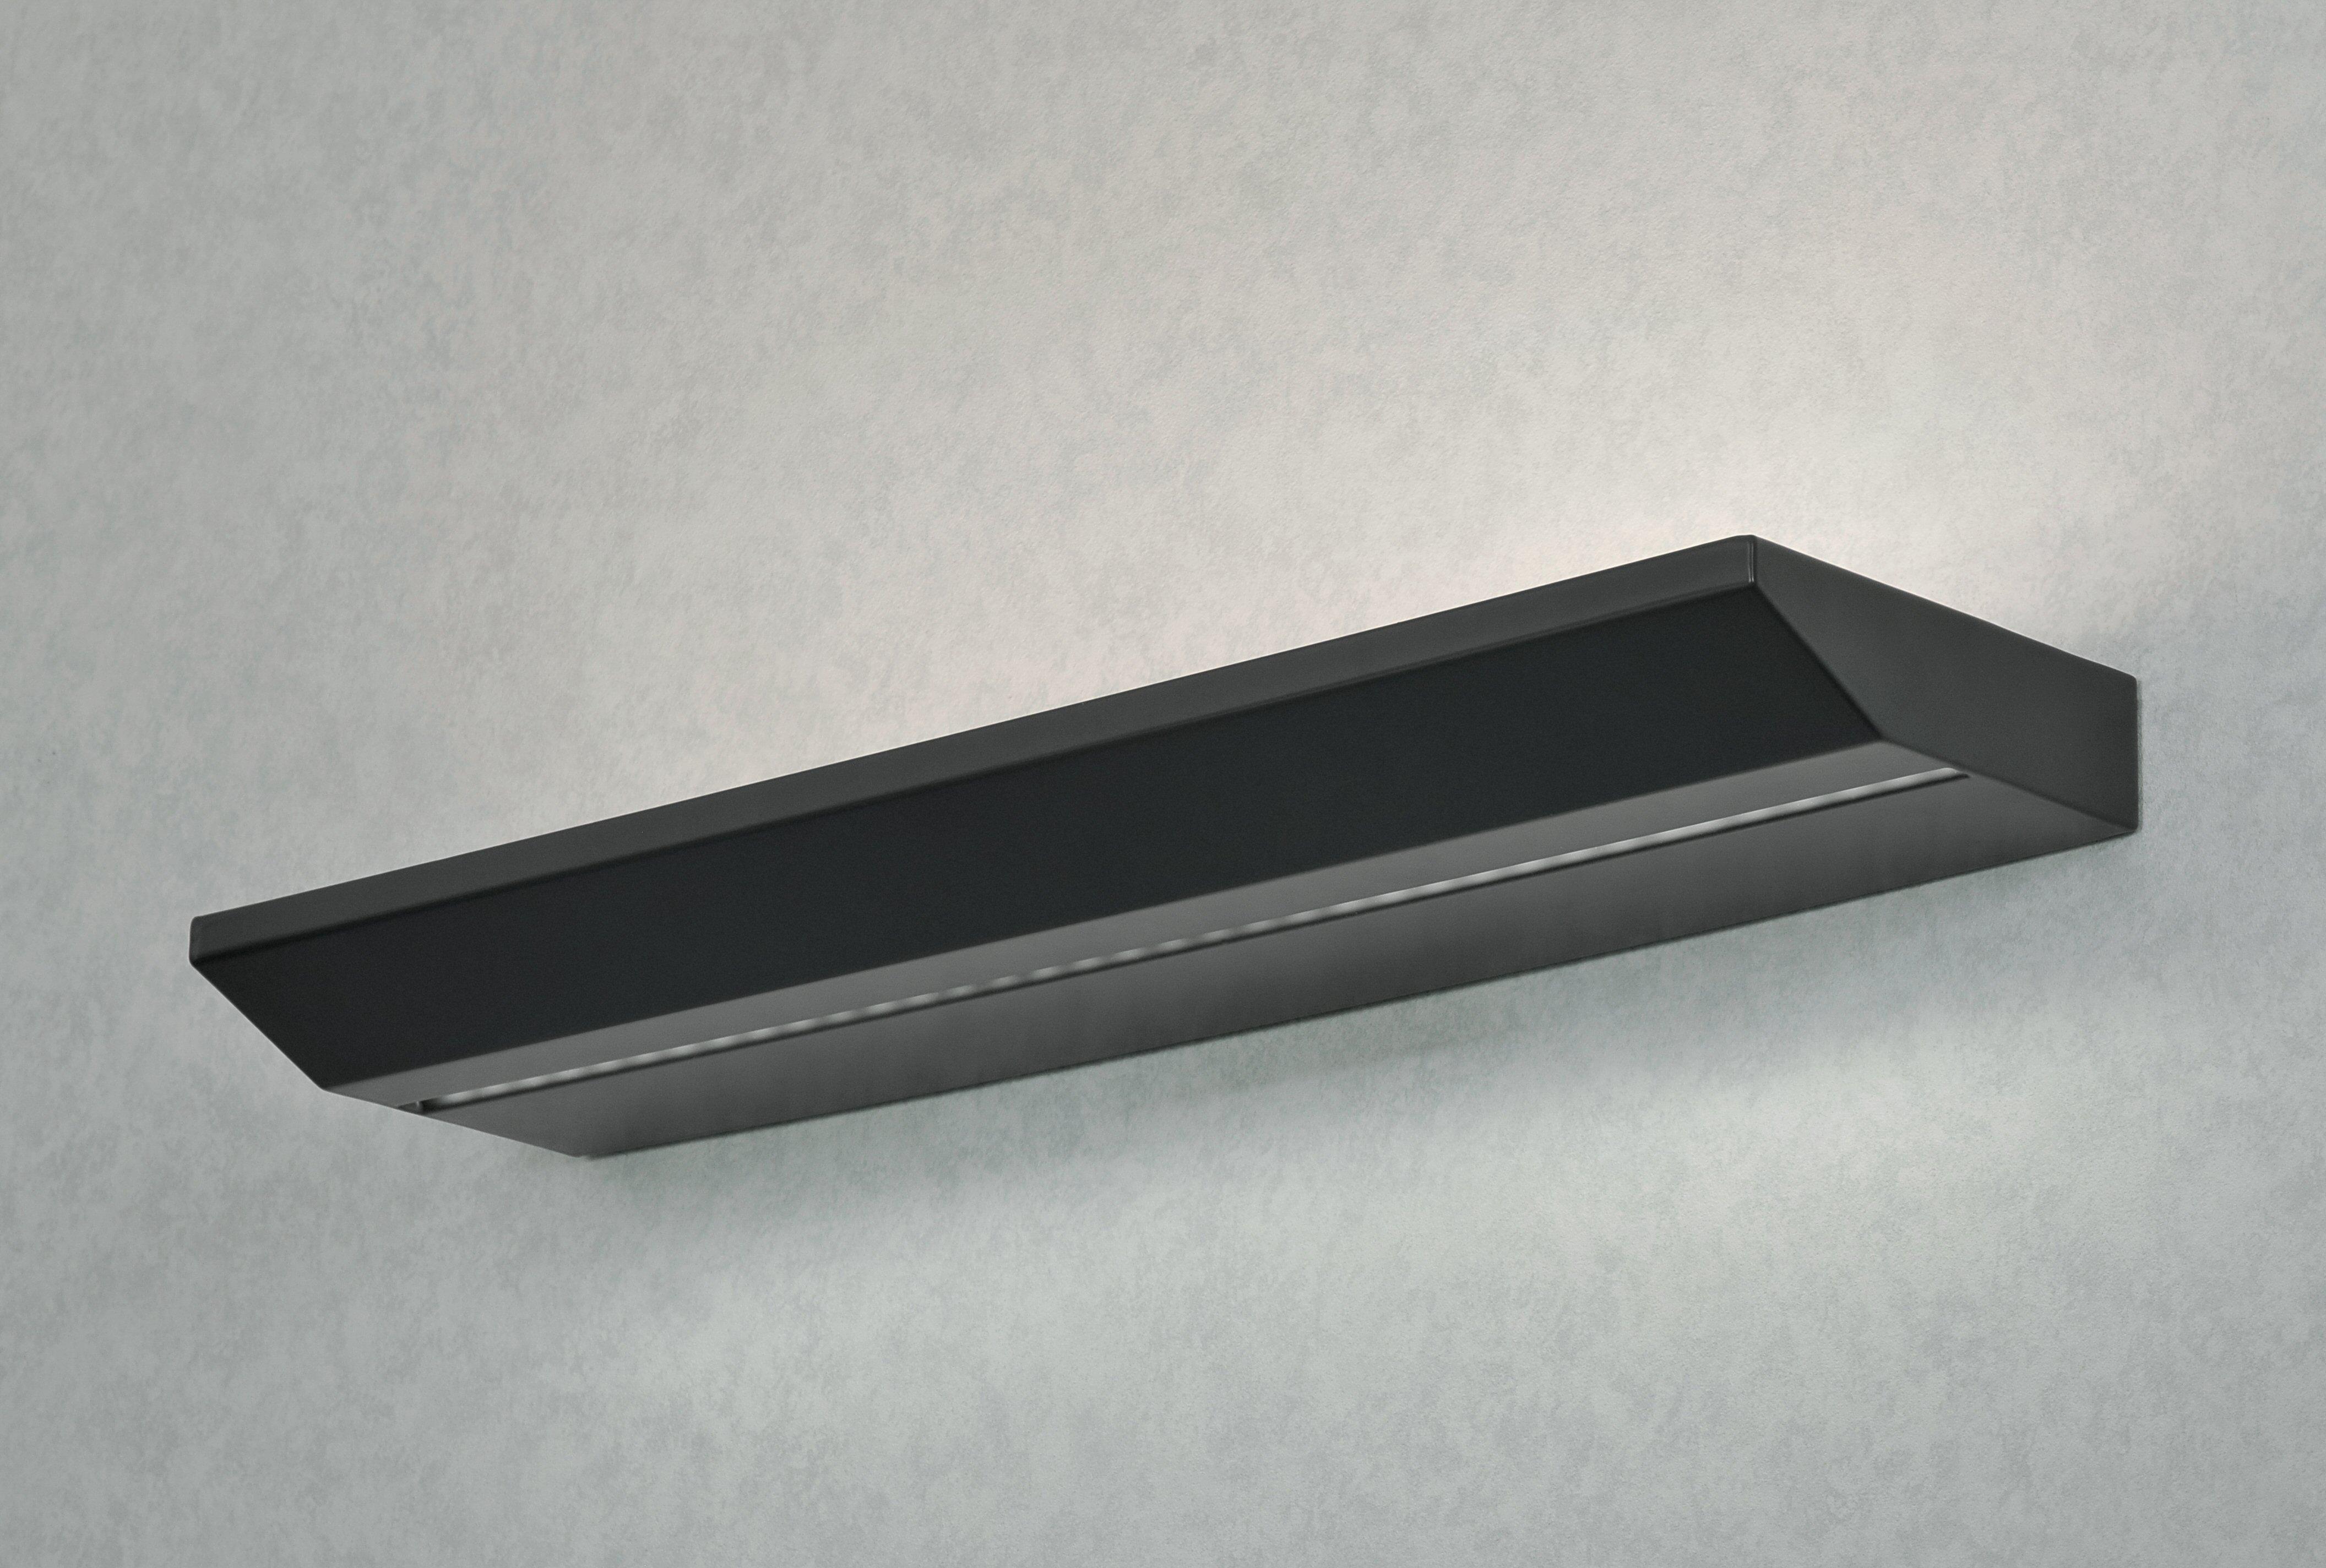 Sovereign 174 Ecoblade Led Uplighters Design Buy Build